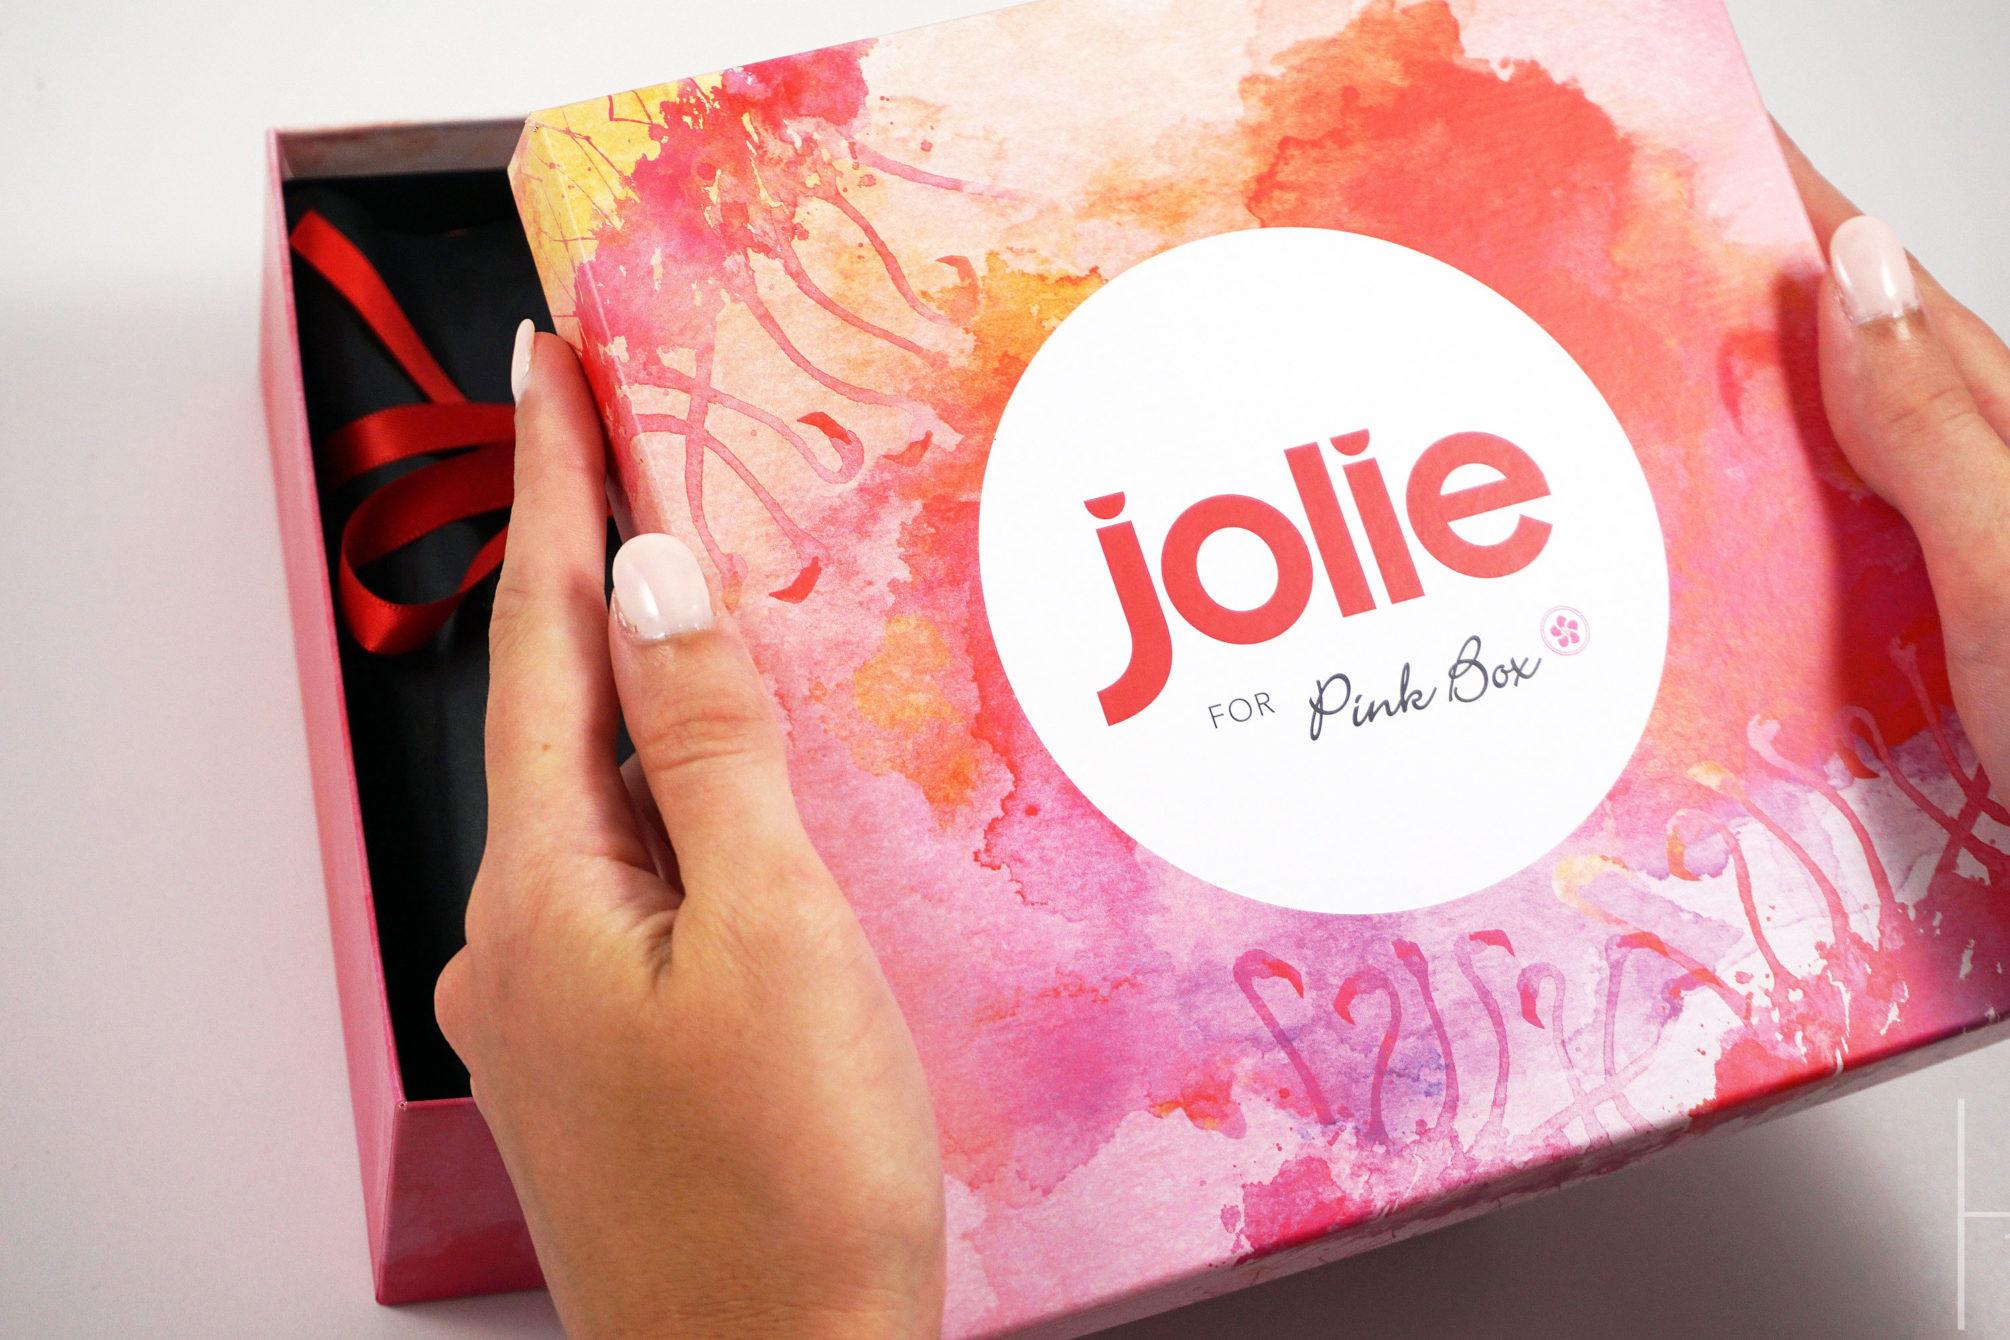 Jolie for Pink Box Juli 2016